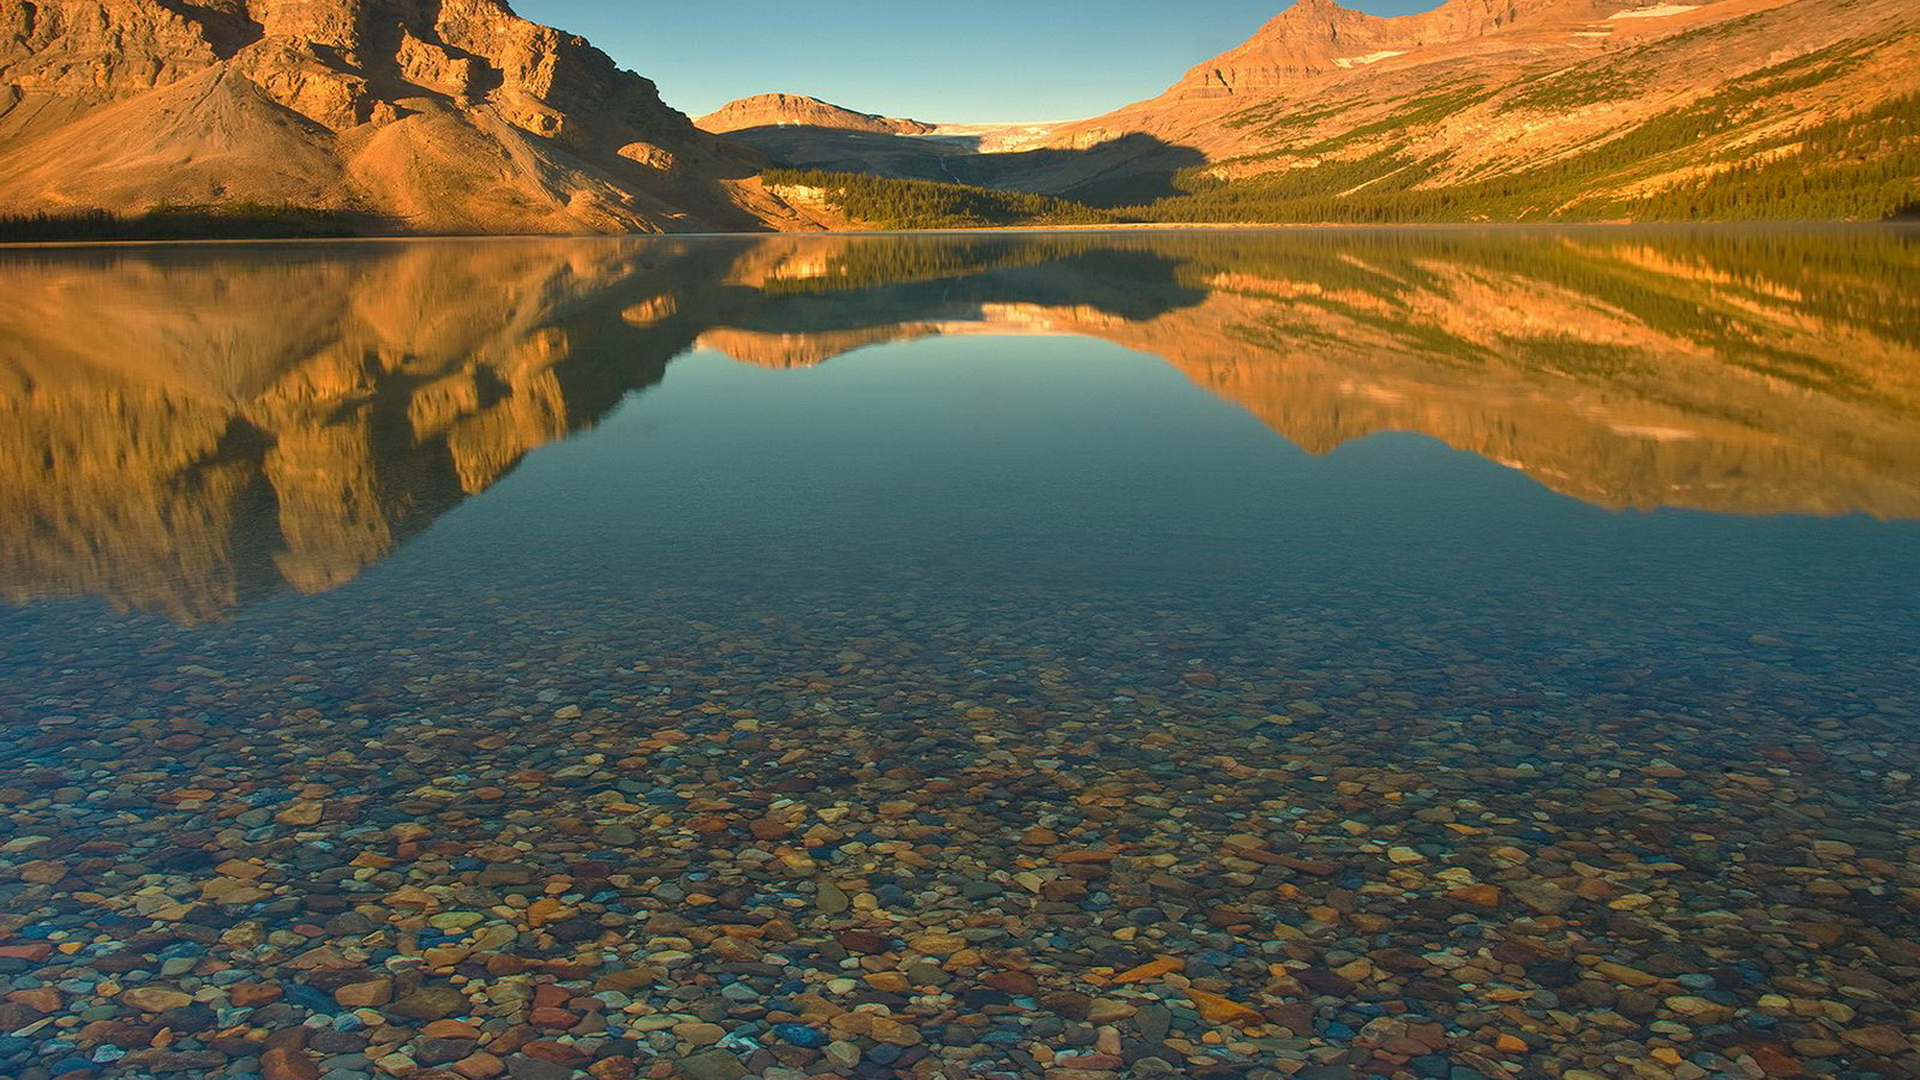 River Rock Wallpaper Canyon River Rock iPhone Wallpaper Canyon River 1920x1080